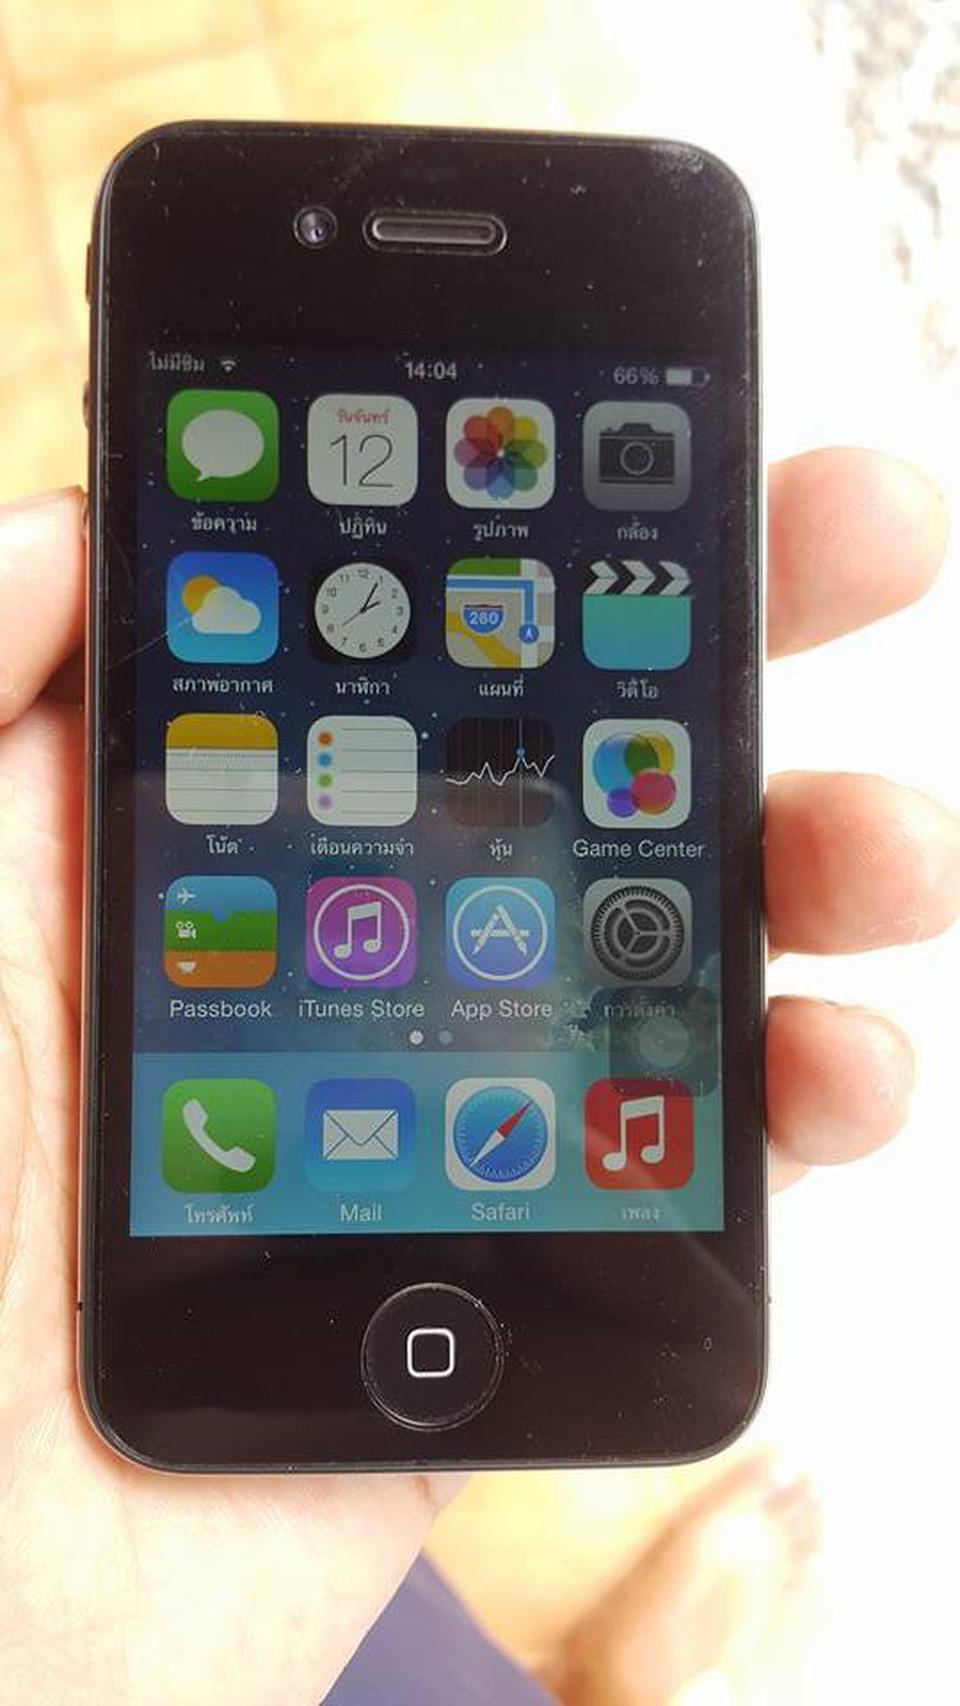 iphone4 16gb เครื่องโมเดลไทย การใช้งานปกติไม่ติดไอดีหรือรหัสอะไร รูปที่ 1